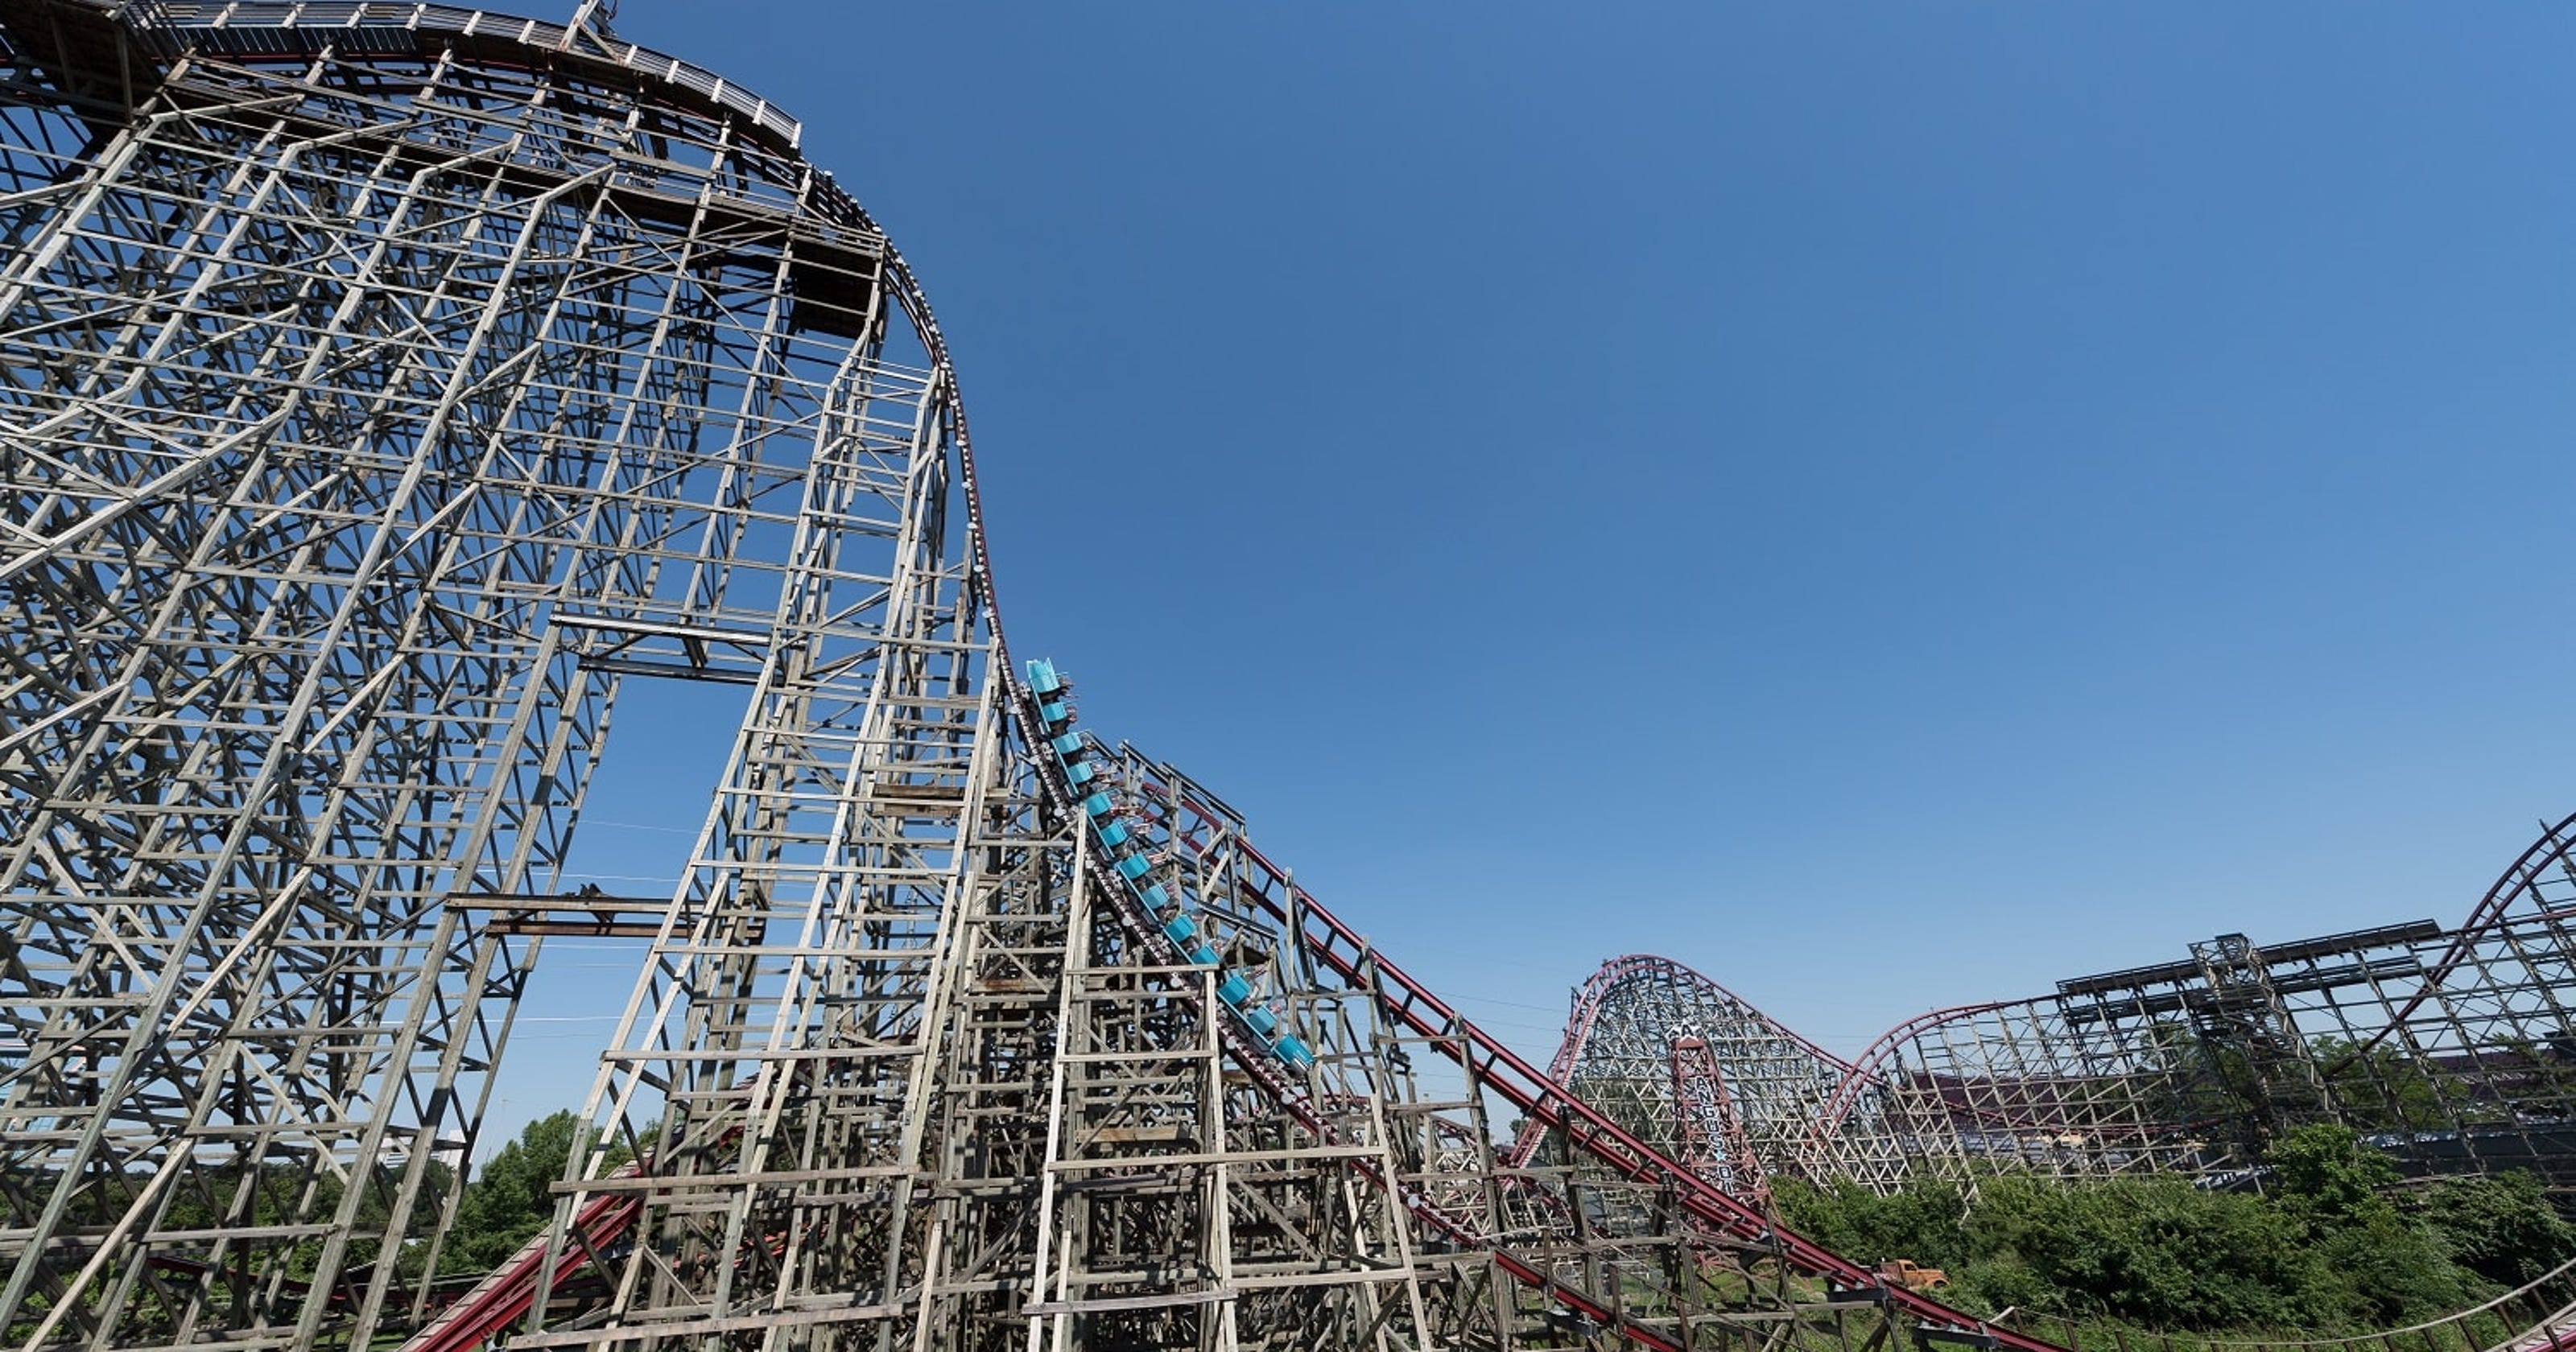 4 amusement park accidents in recent memory